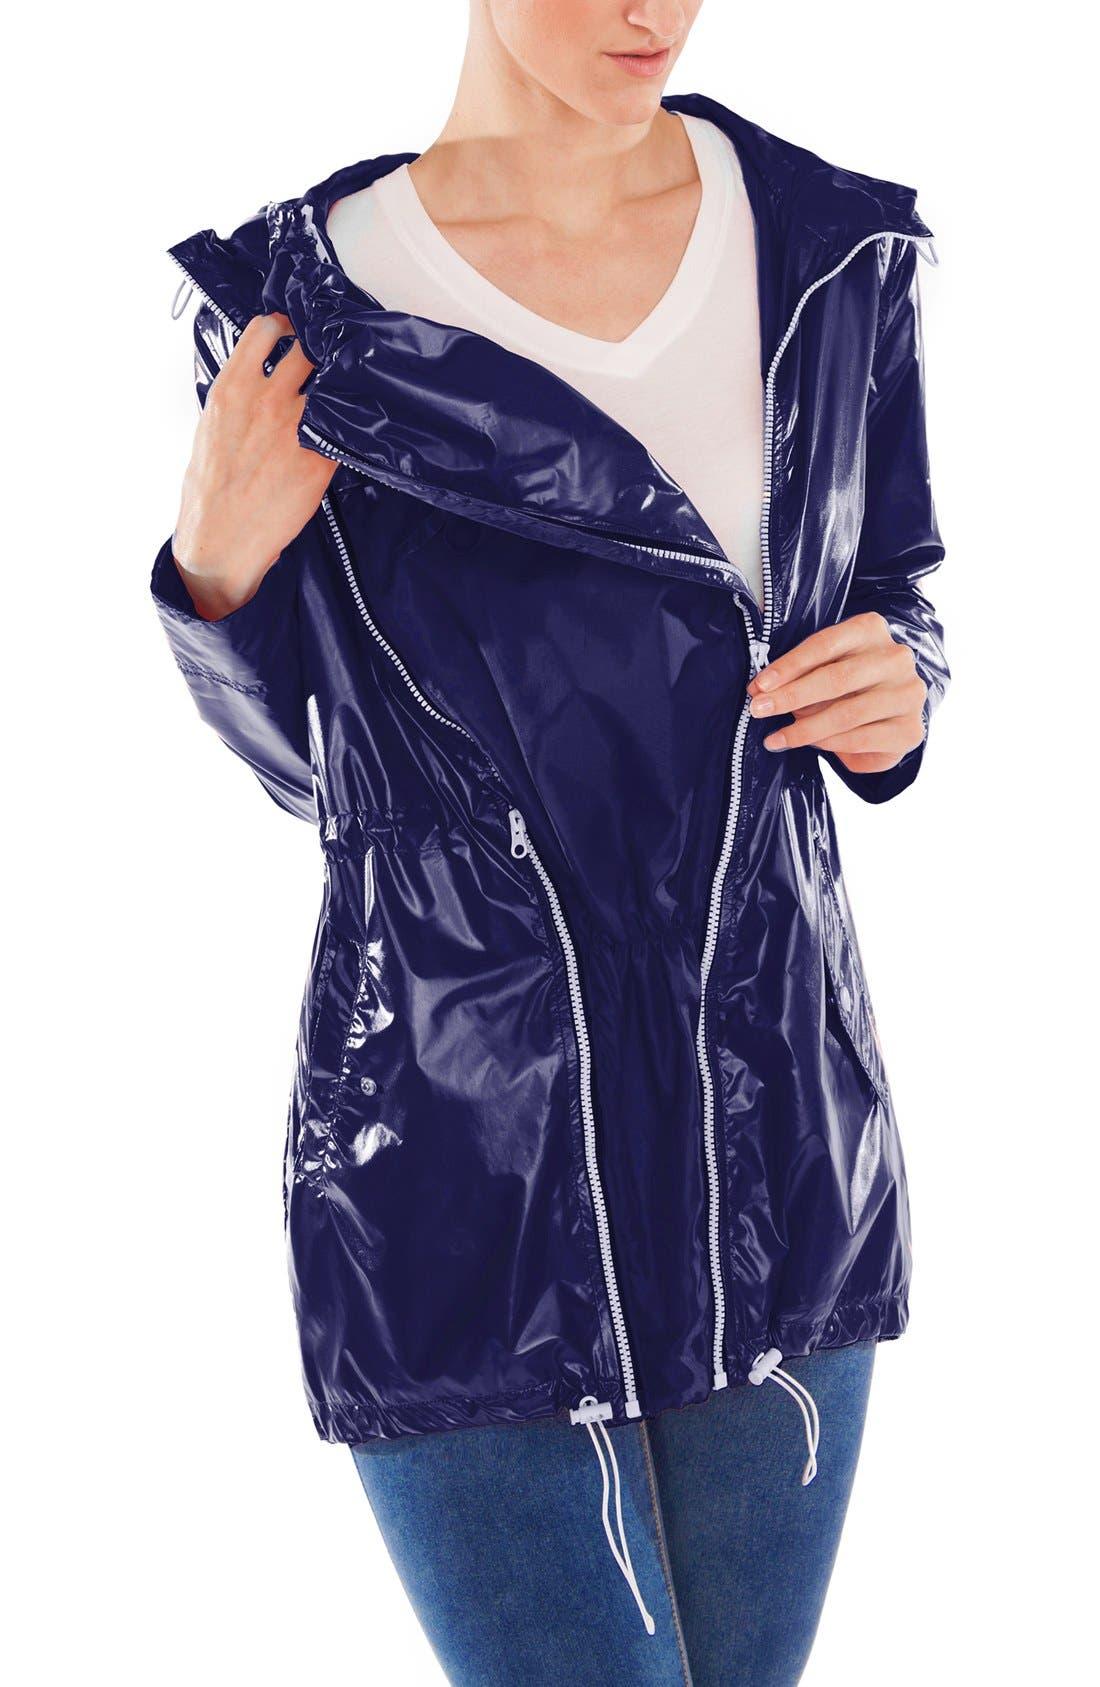 Waterproof Convertible 3-in-1 Maternity Raincoat,                             Alternate thumbnail 11, color,                             BRIGHT NAVY